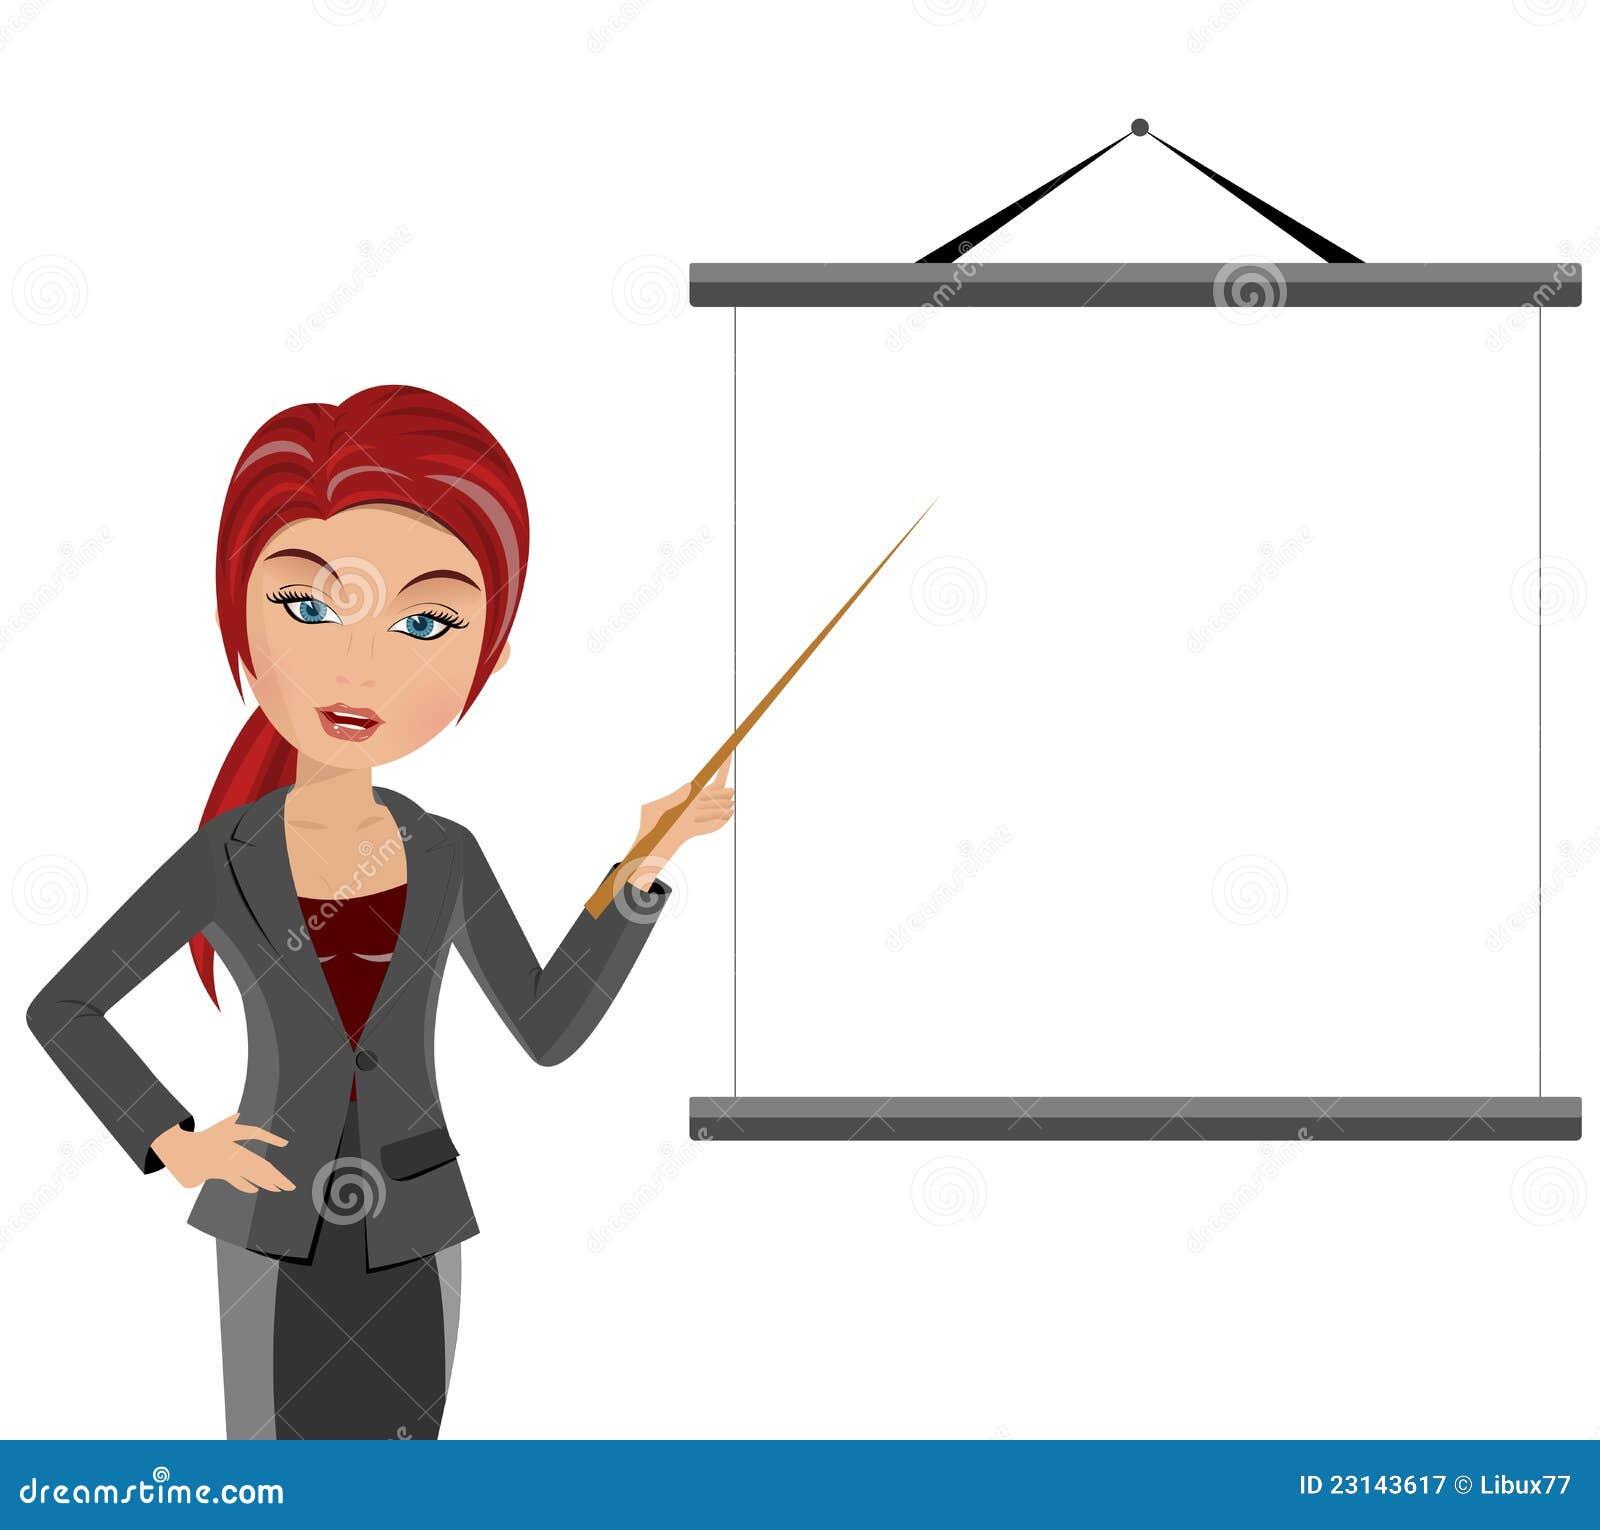 clipart woman teacher - photo #26